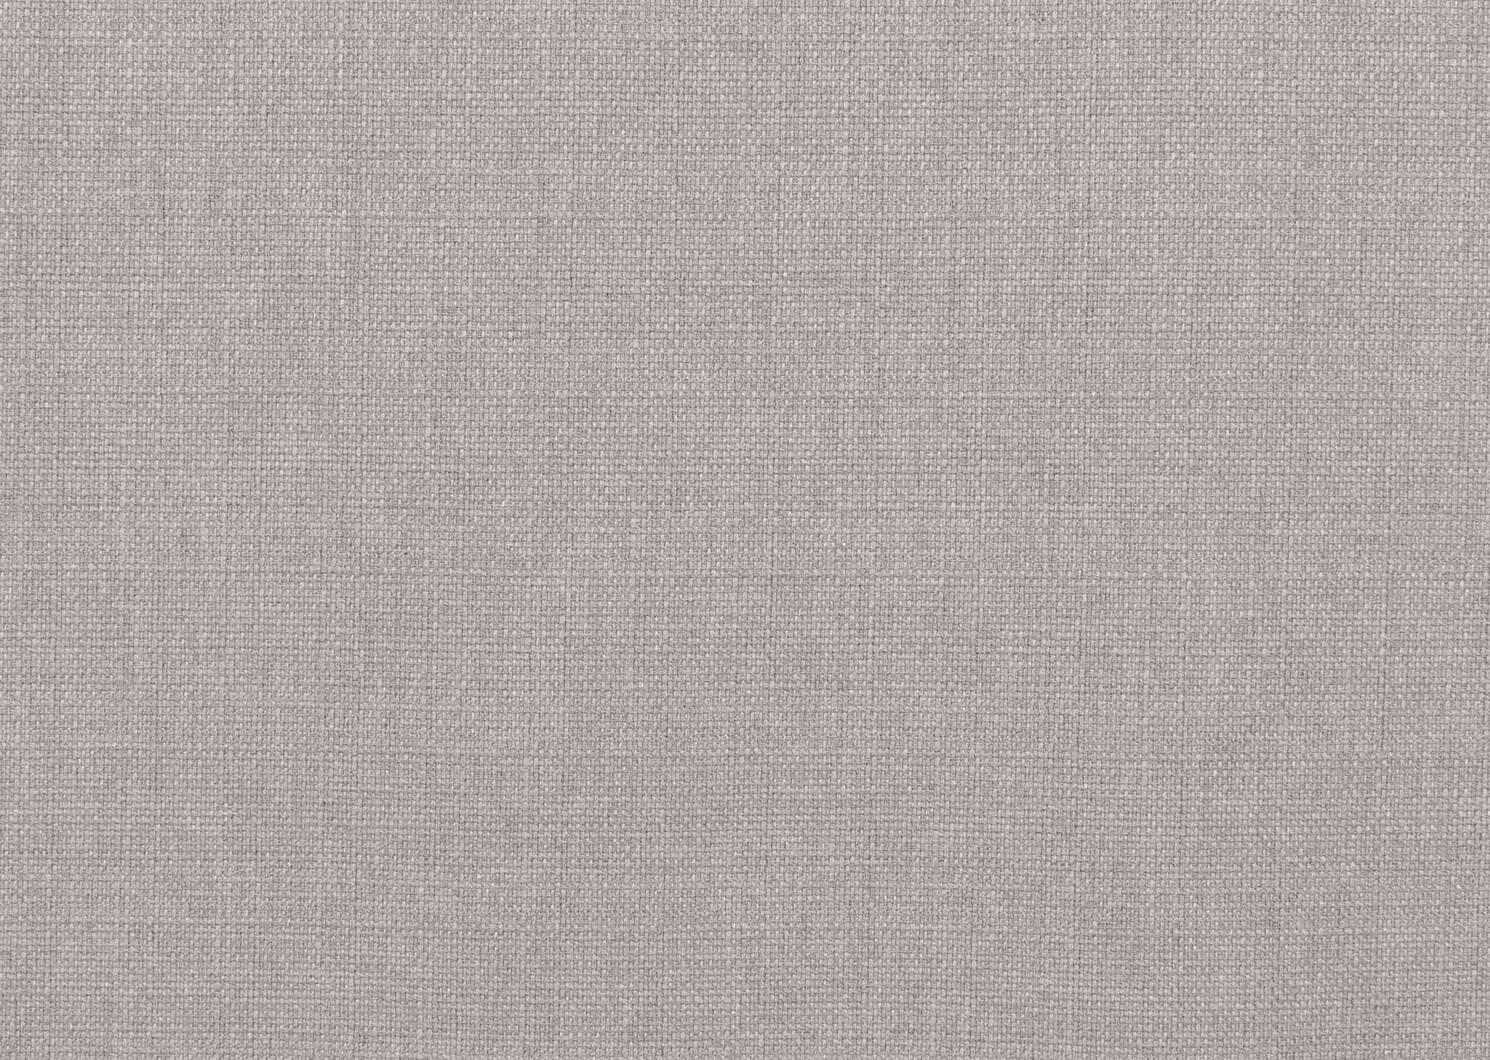 Kaden Panel 108 Lt Grey